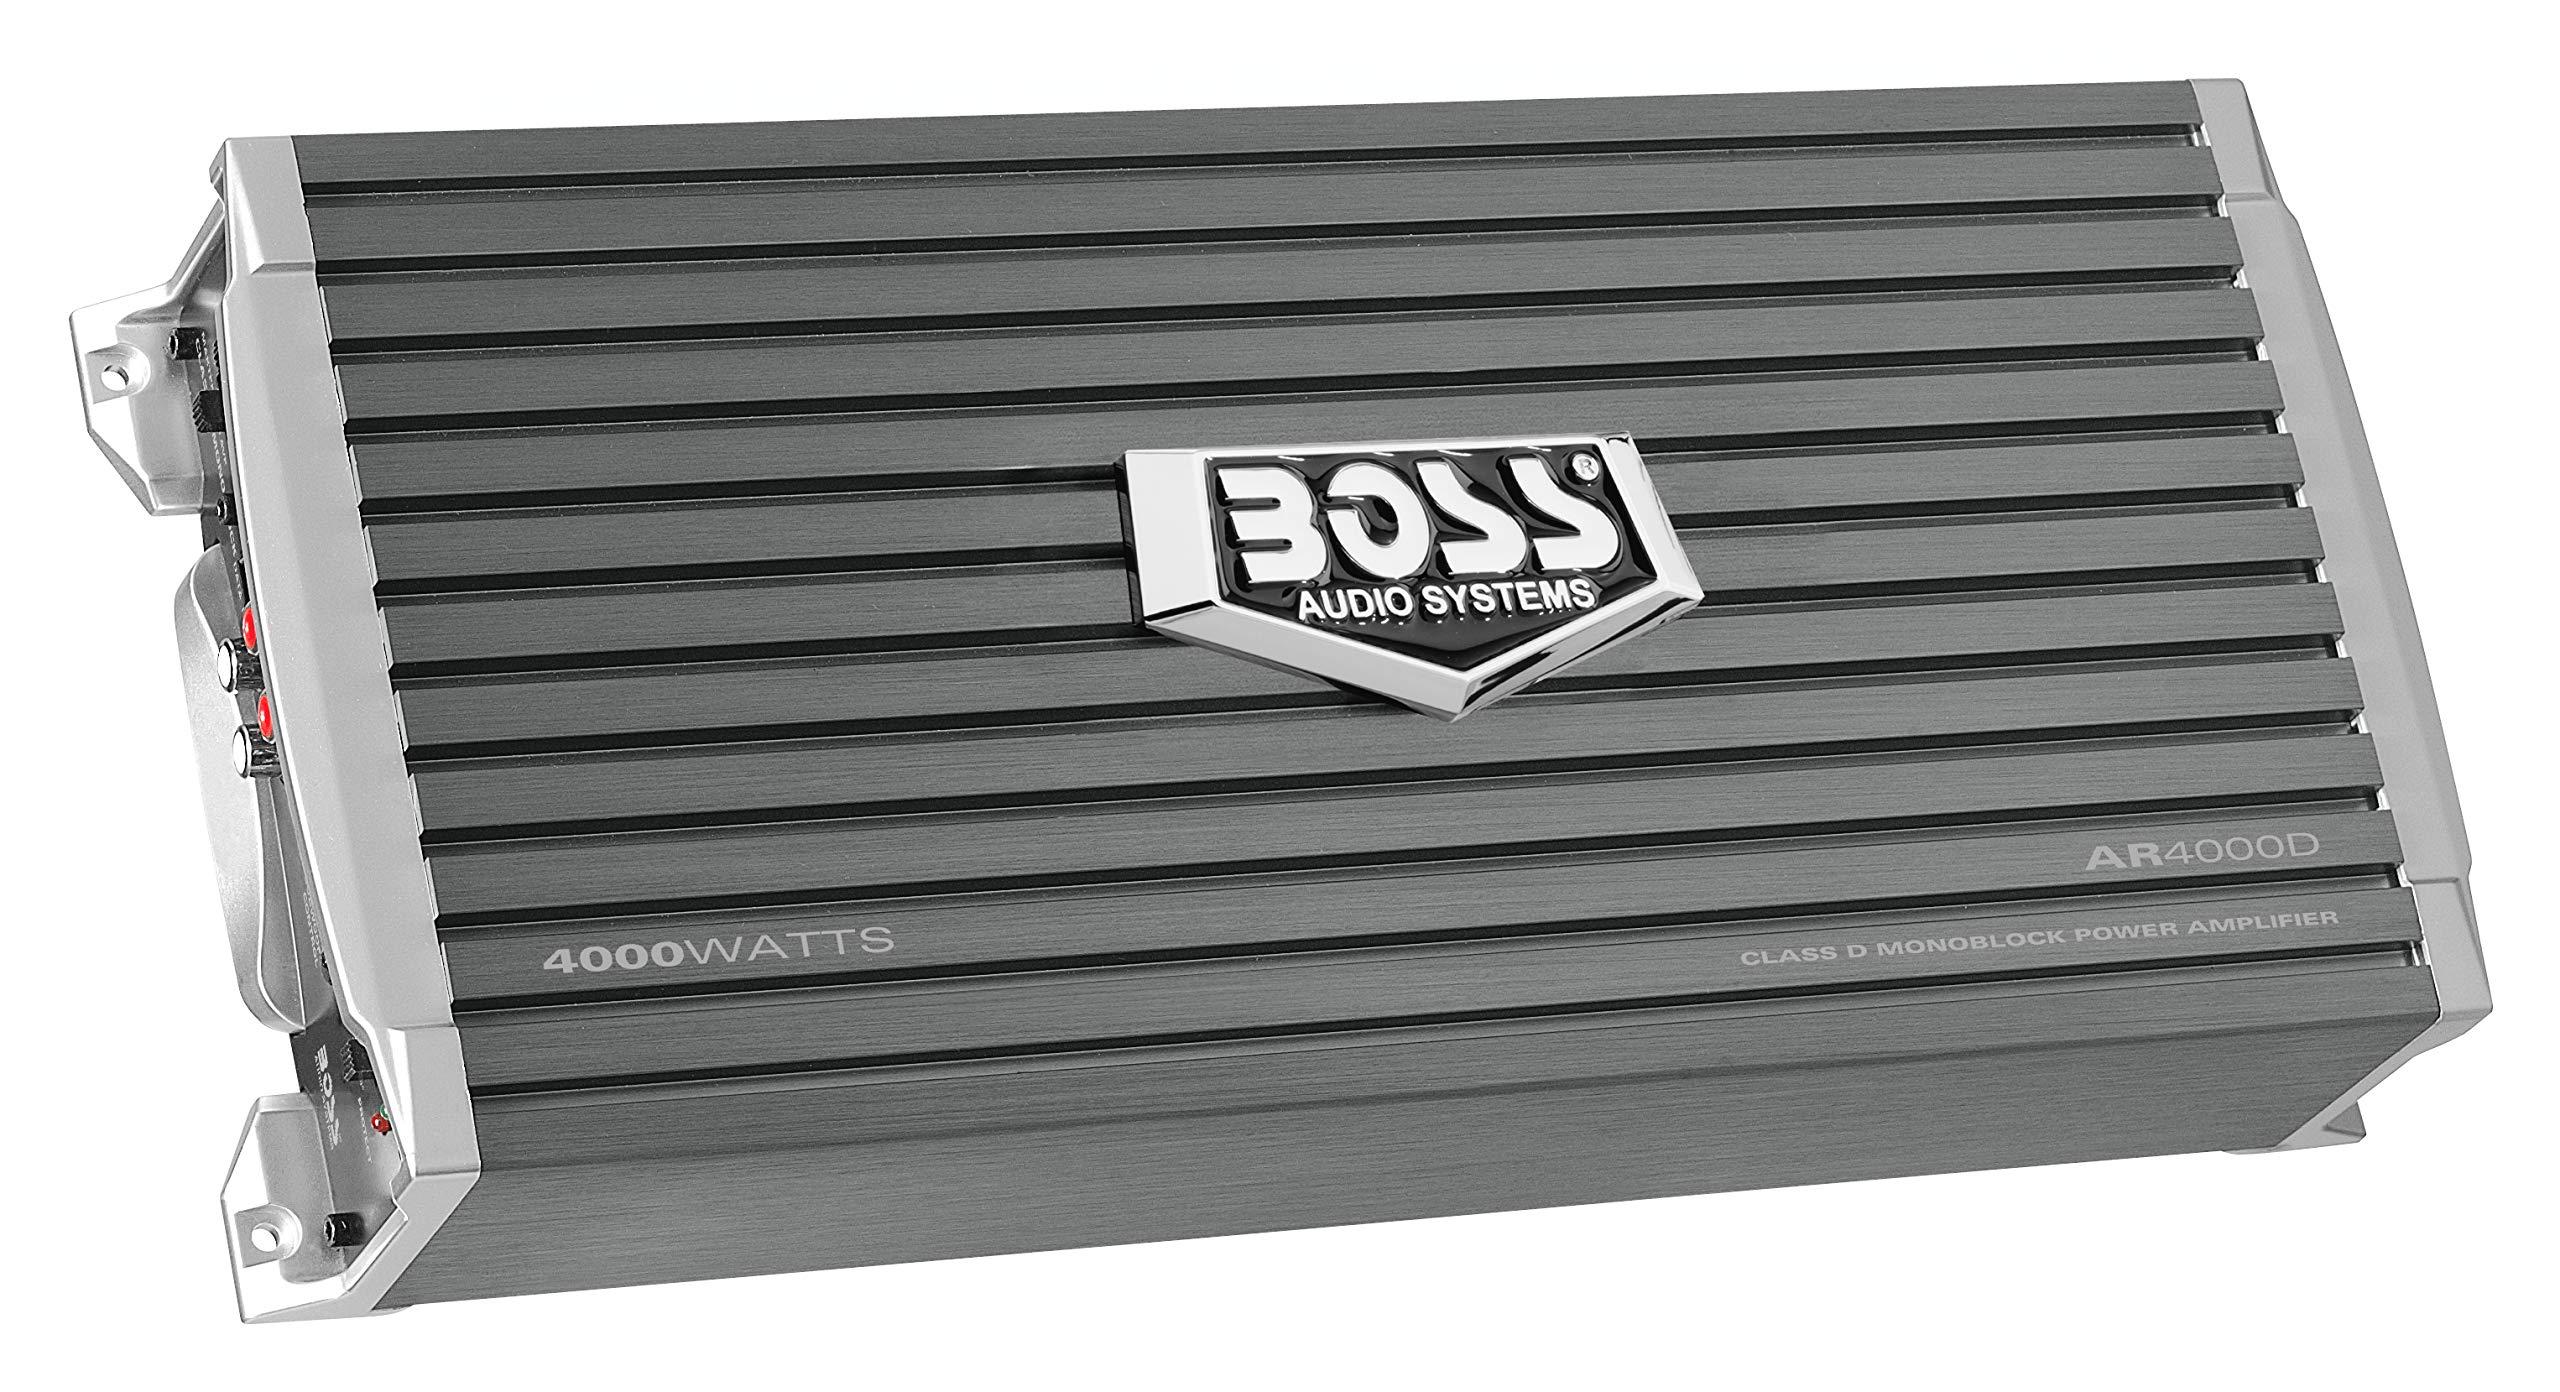 BOSS Audio AR4000D Armor 4000 Watt, 1, 2, 4 Ohm Stable Class D Monoblock Car Amplifier with Remote Subwoofer Control